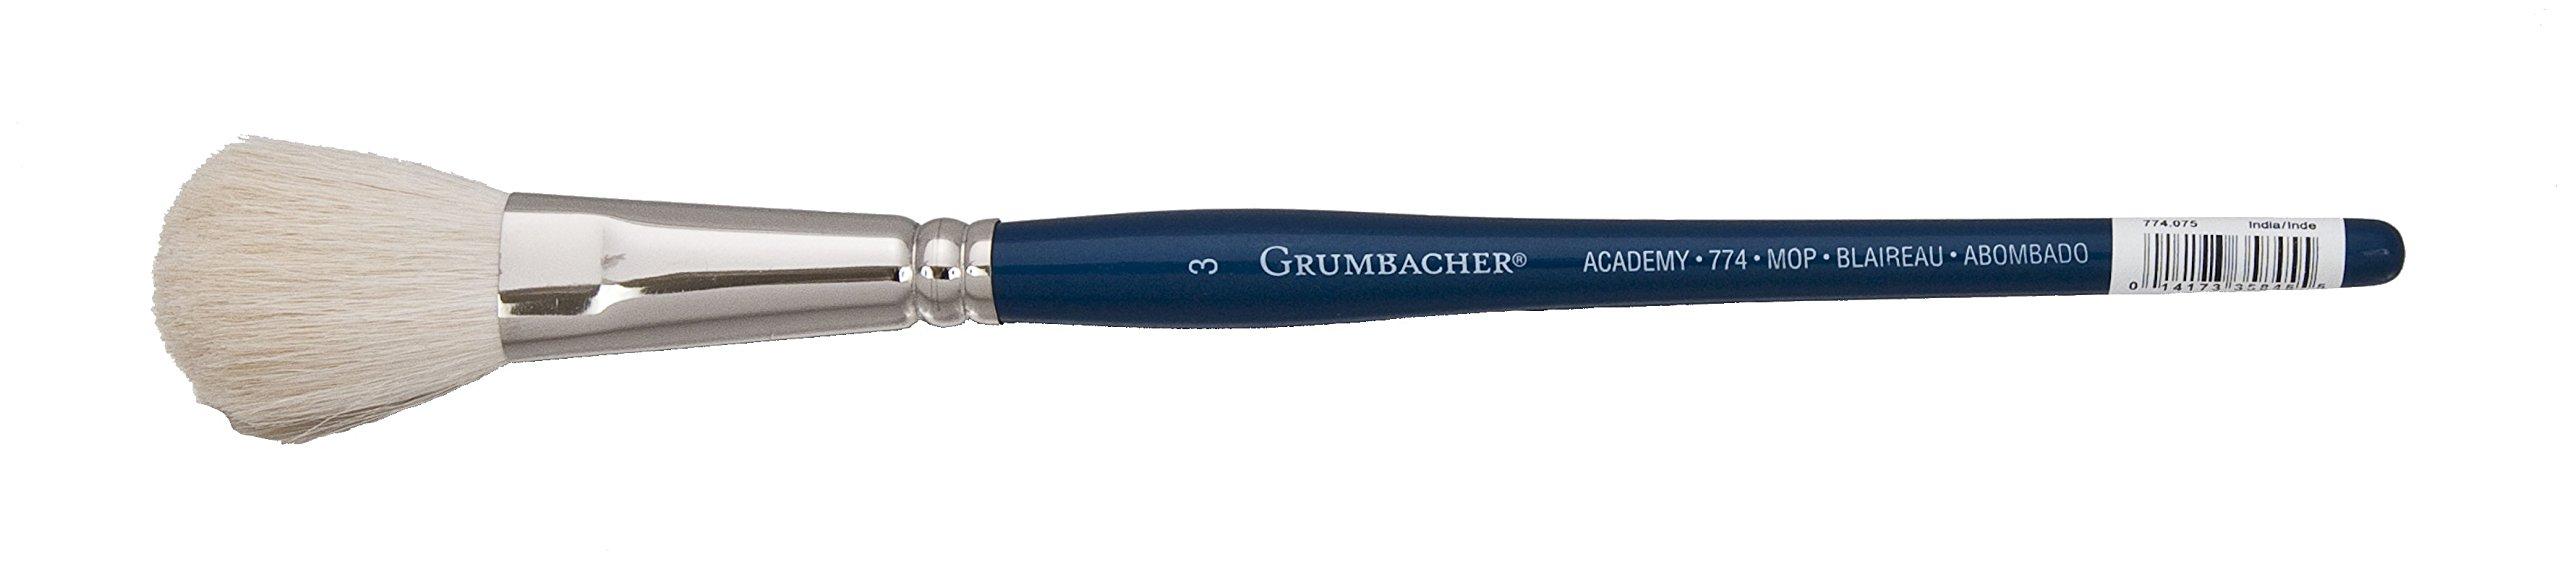 Grumbacher Academy Watercolor Round Mop Brush, White Nylon Bristles, 3/4'' Size (774.075)